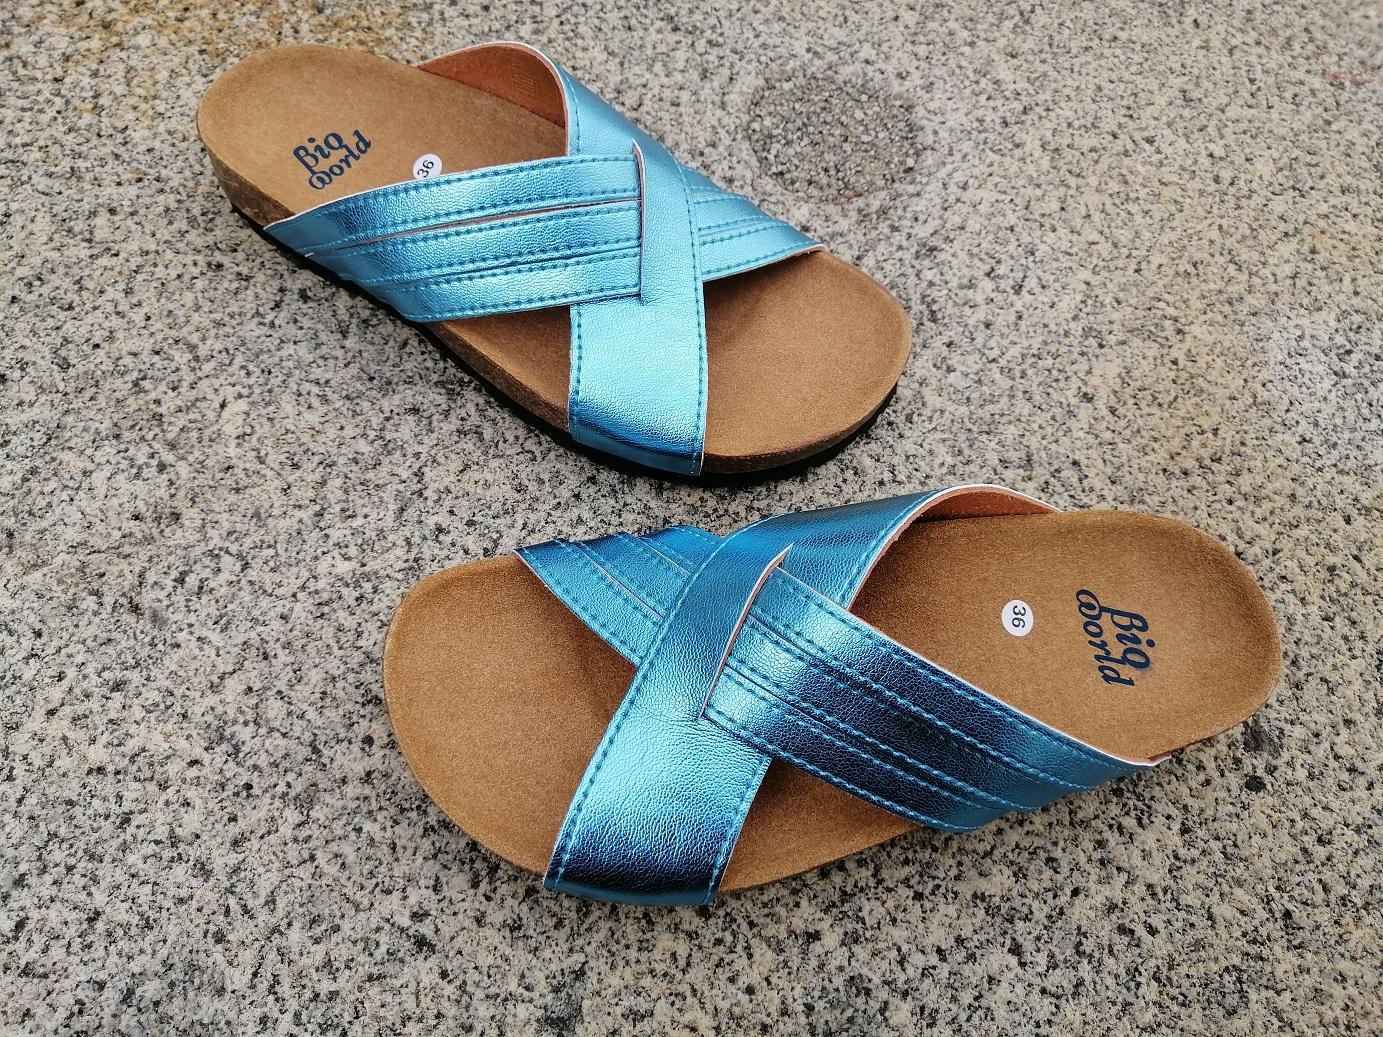 PAVIA color ACQUA, sandalias veganas, sandalias veganas mujer, calzado vegano, sandalias de tacón bajo, sandalias bioworld, vegan shoes.